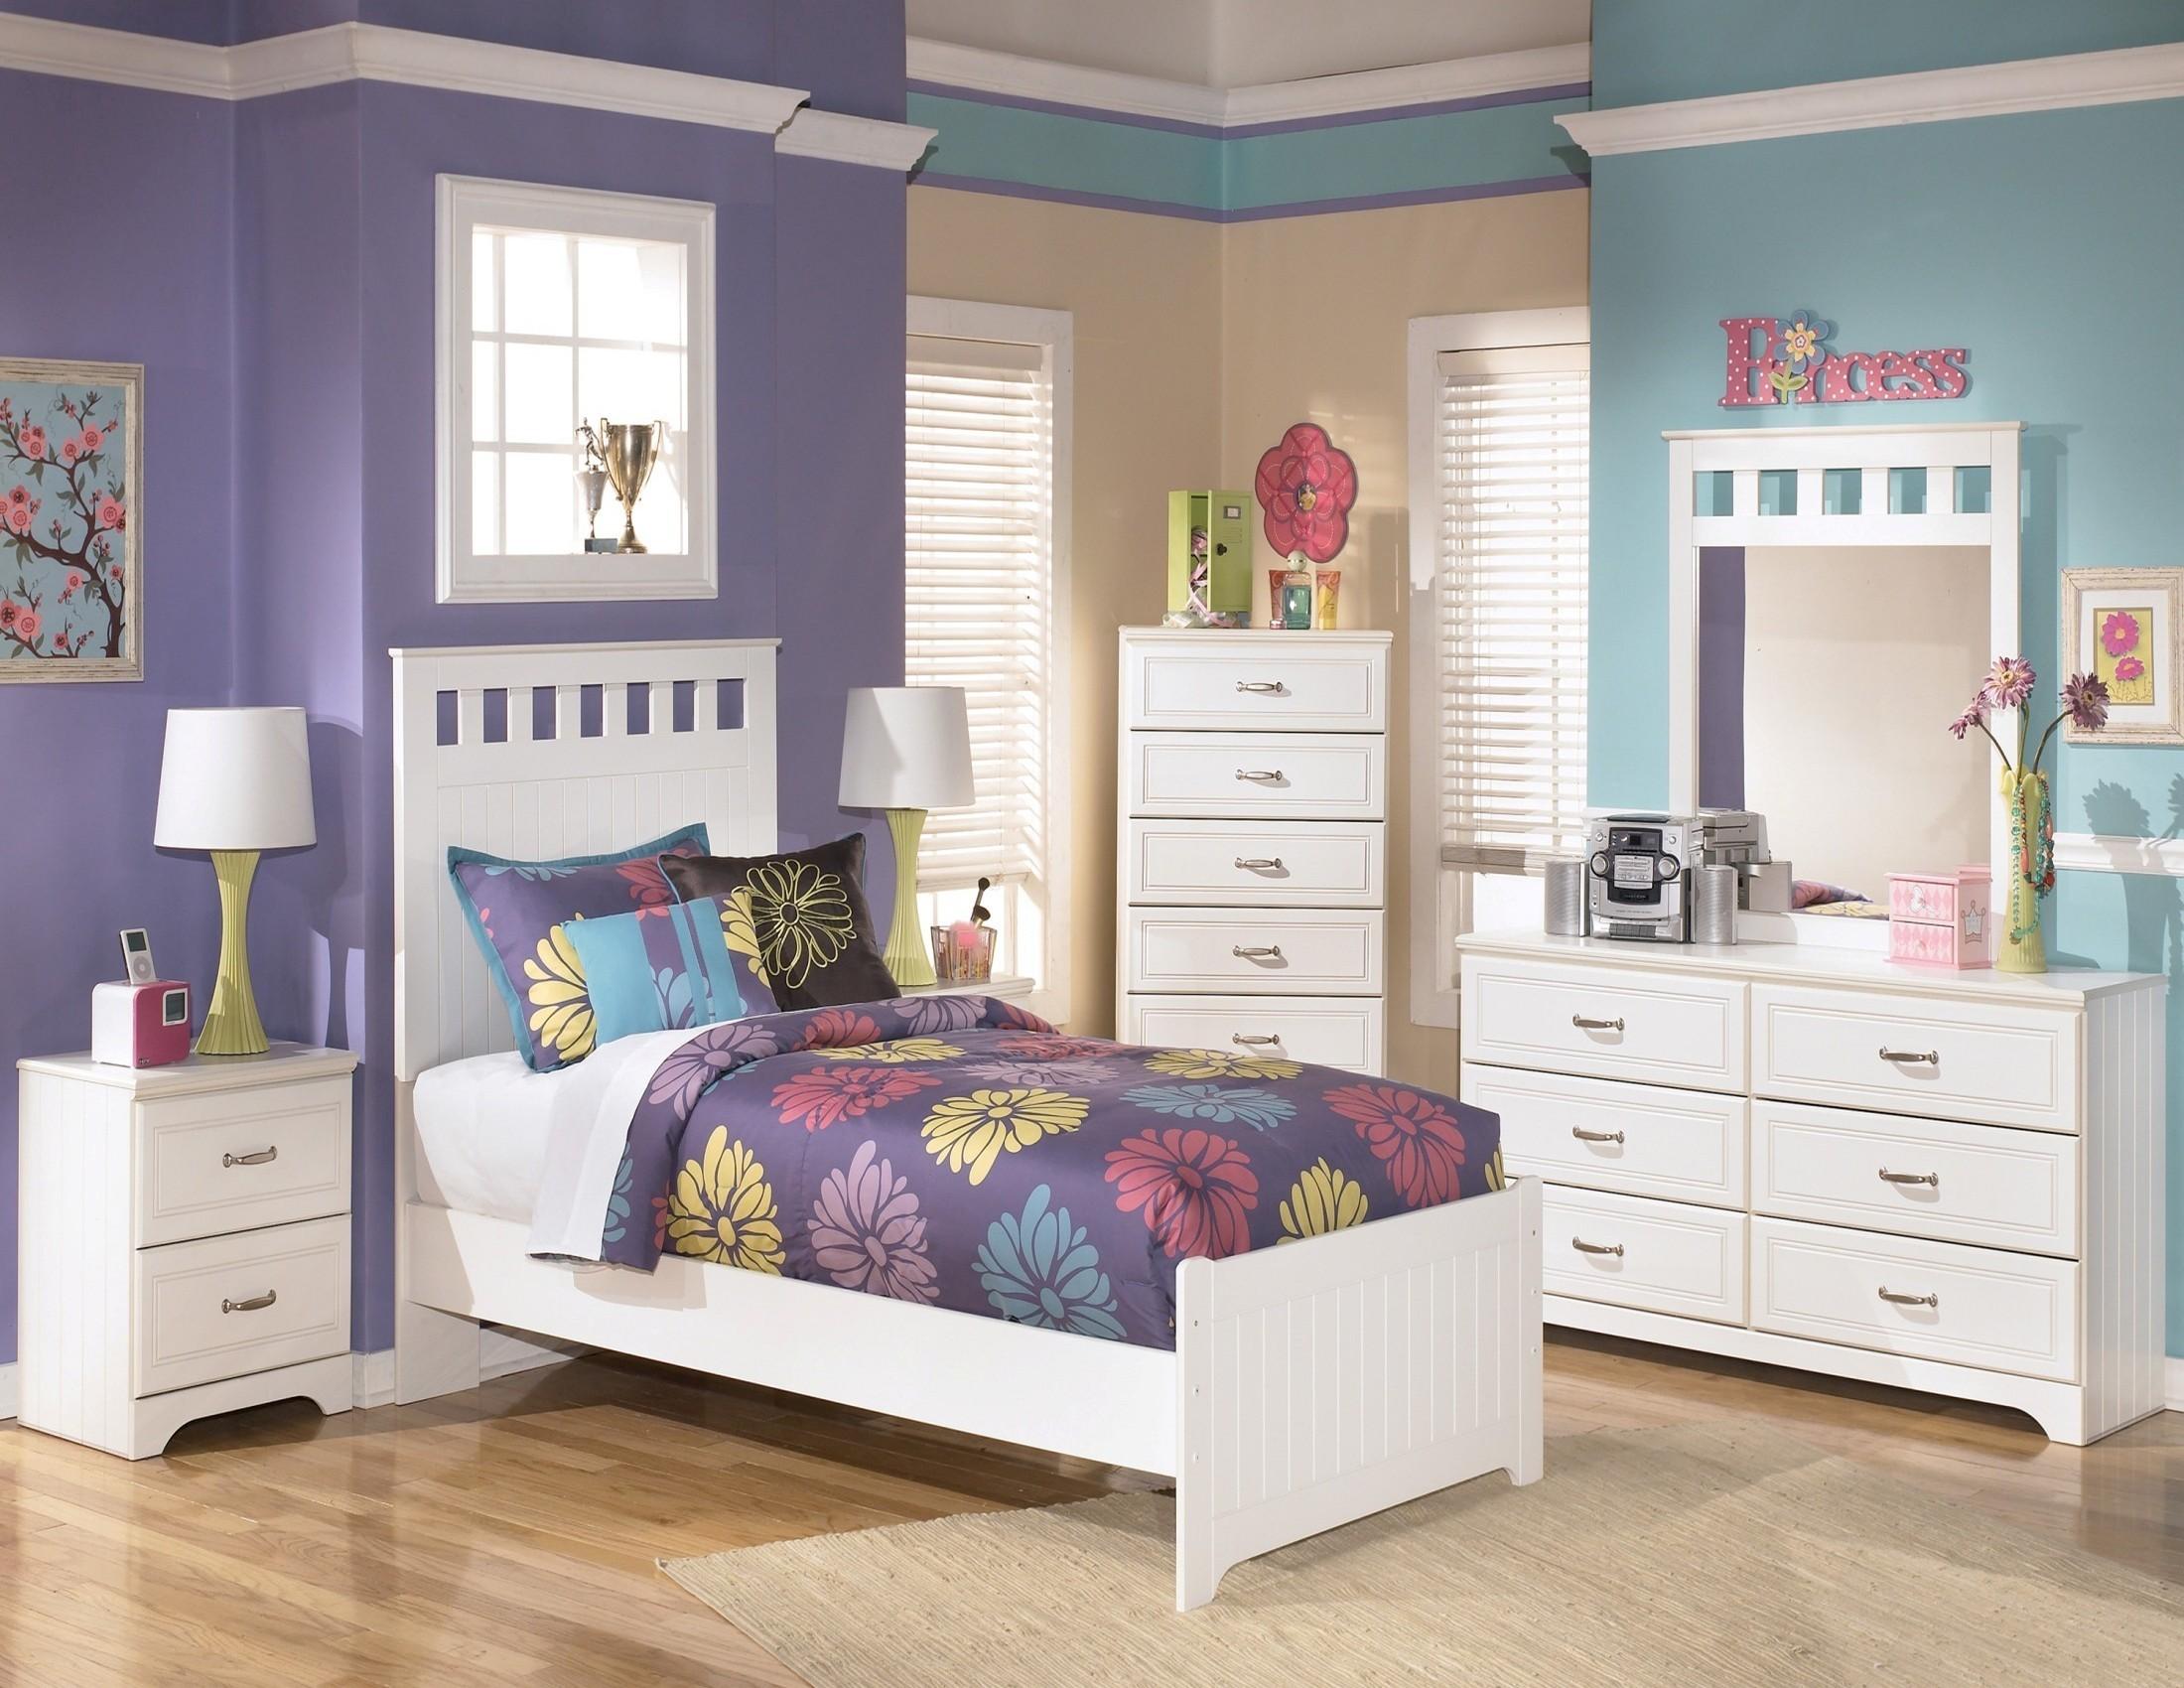 Lulu youth bedroom set from ashley b102 52 51 82 coleman furniture - Juvenile bedroom sets ...